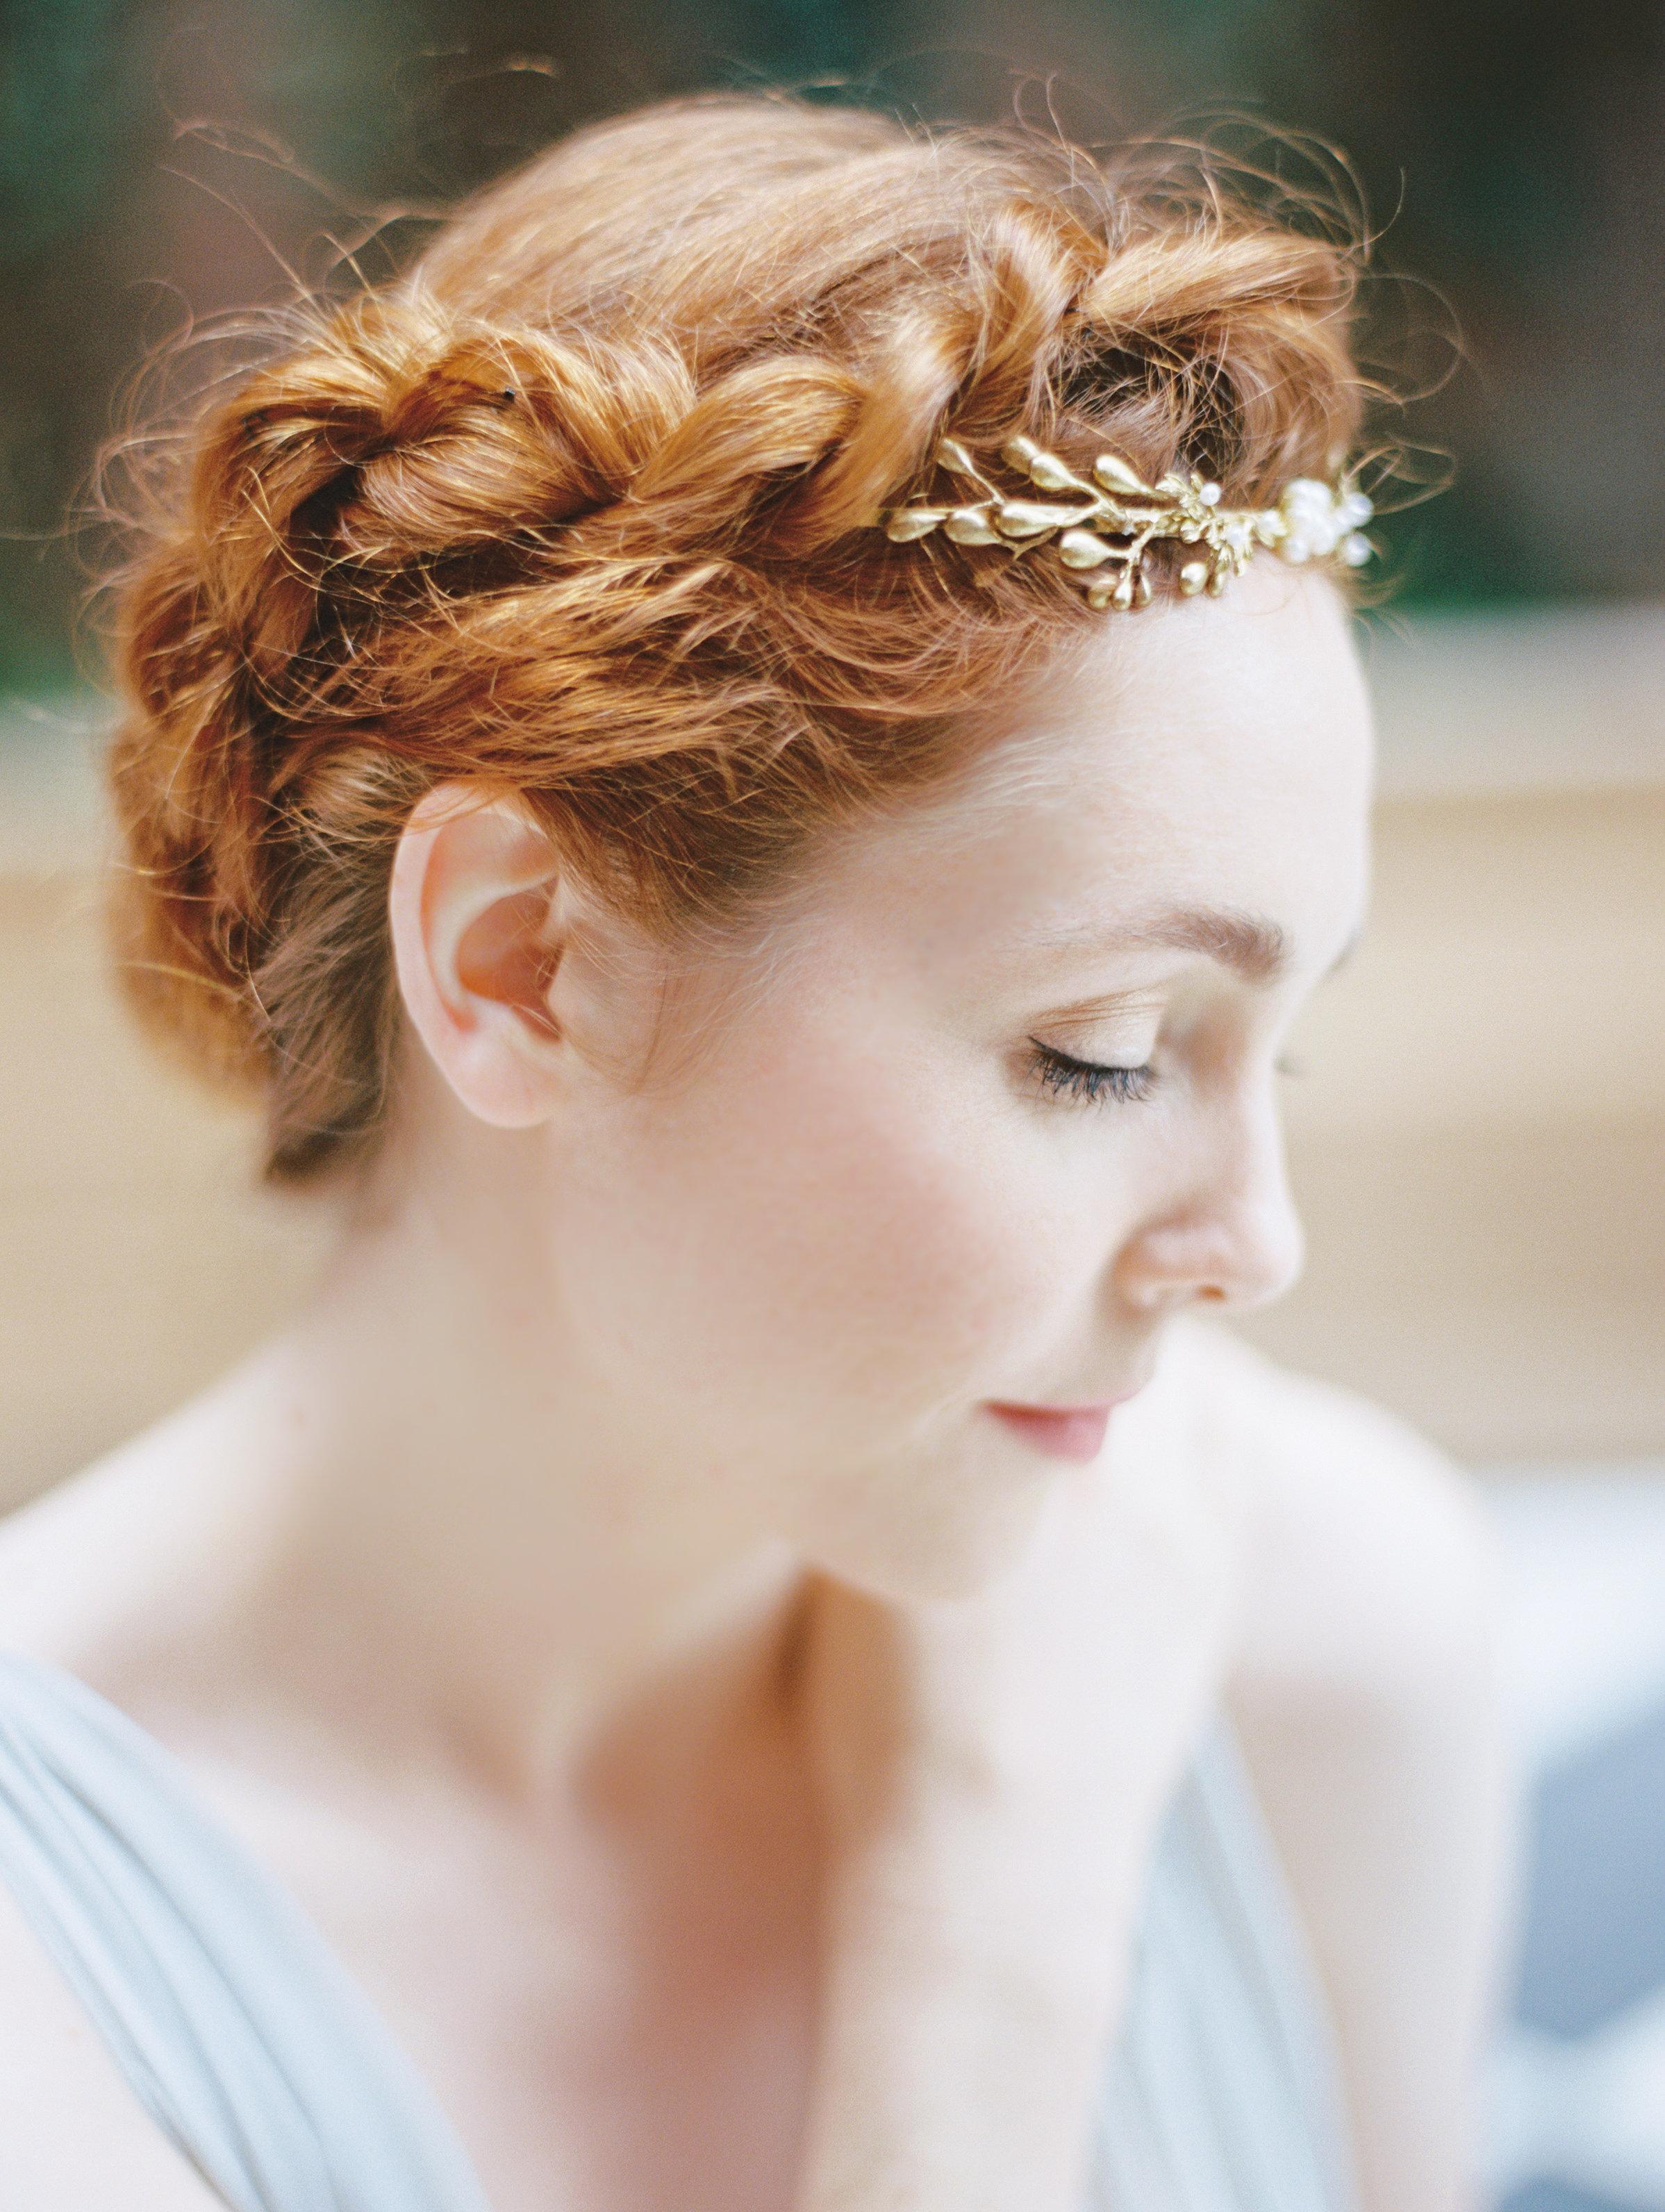 grecian wreath hair piece gold hushed commotion brooklyn braid